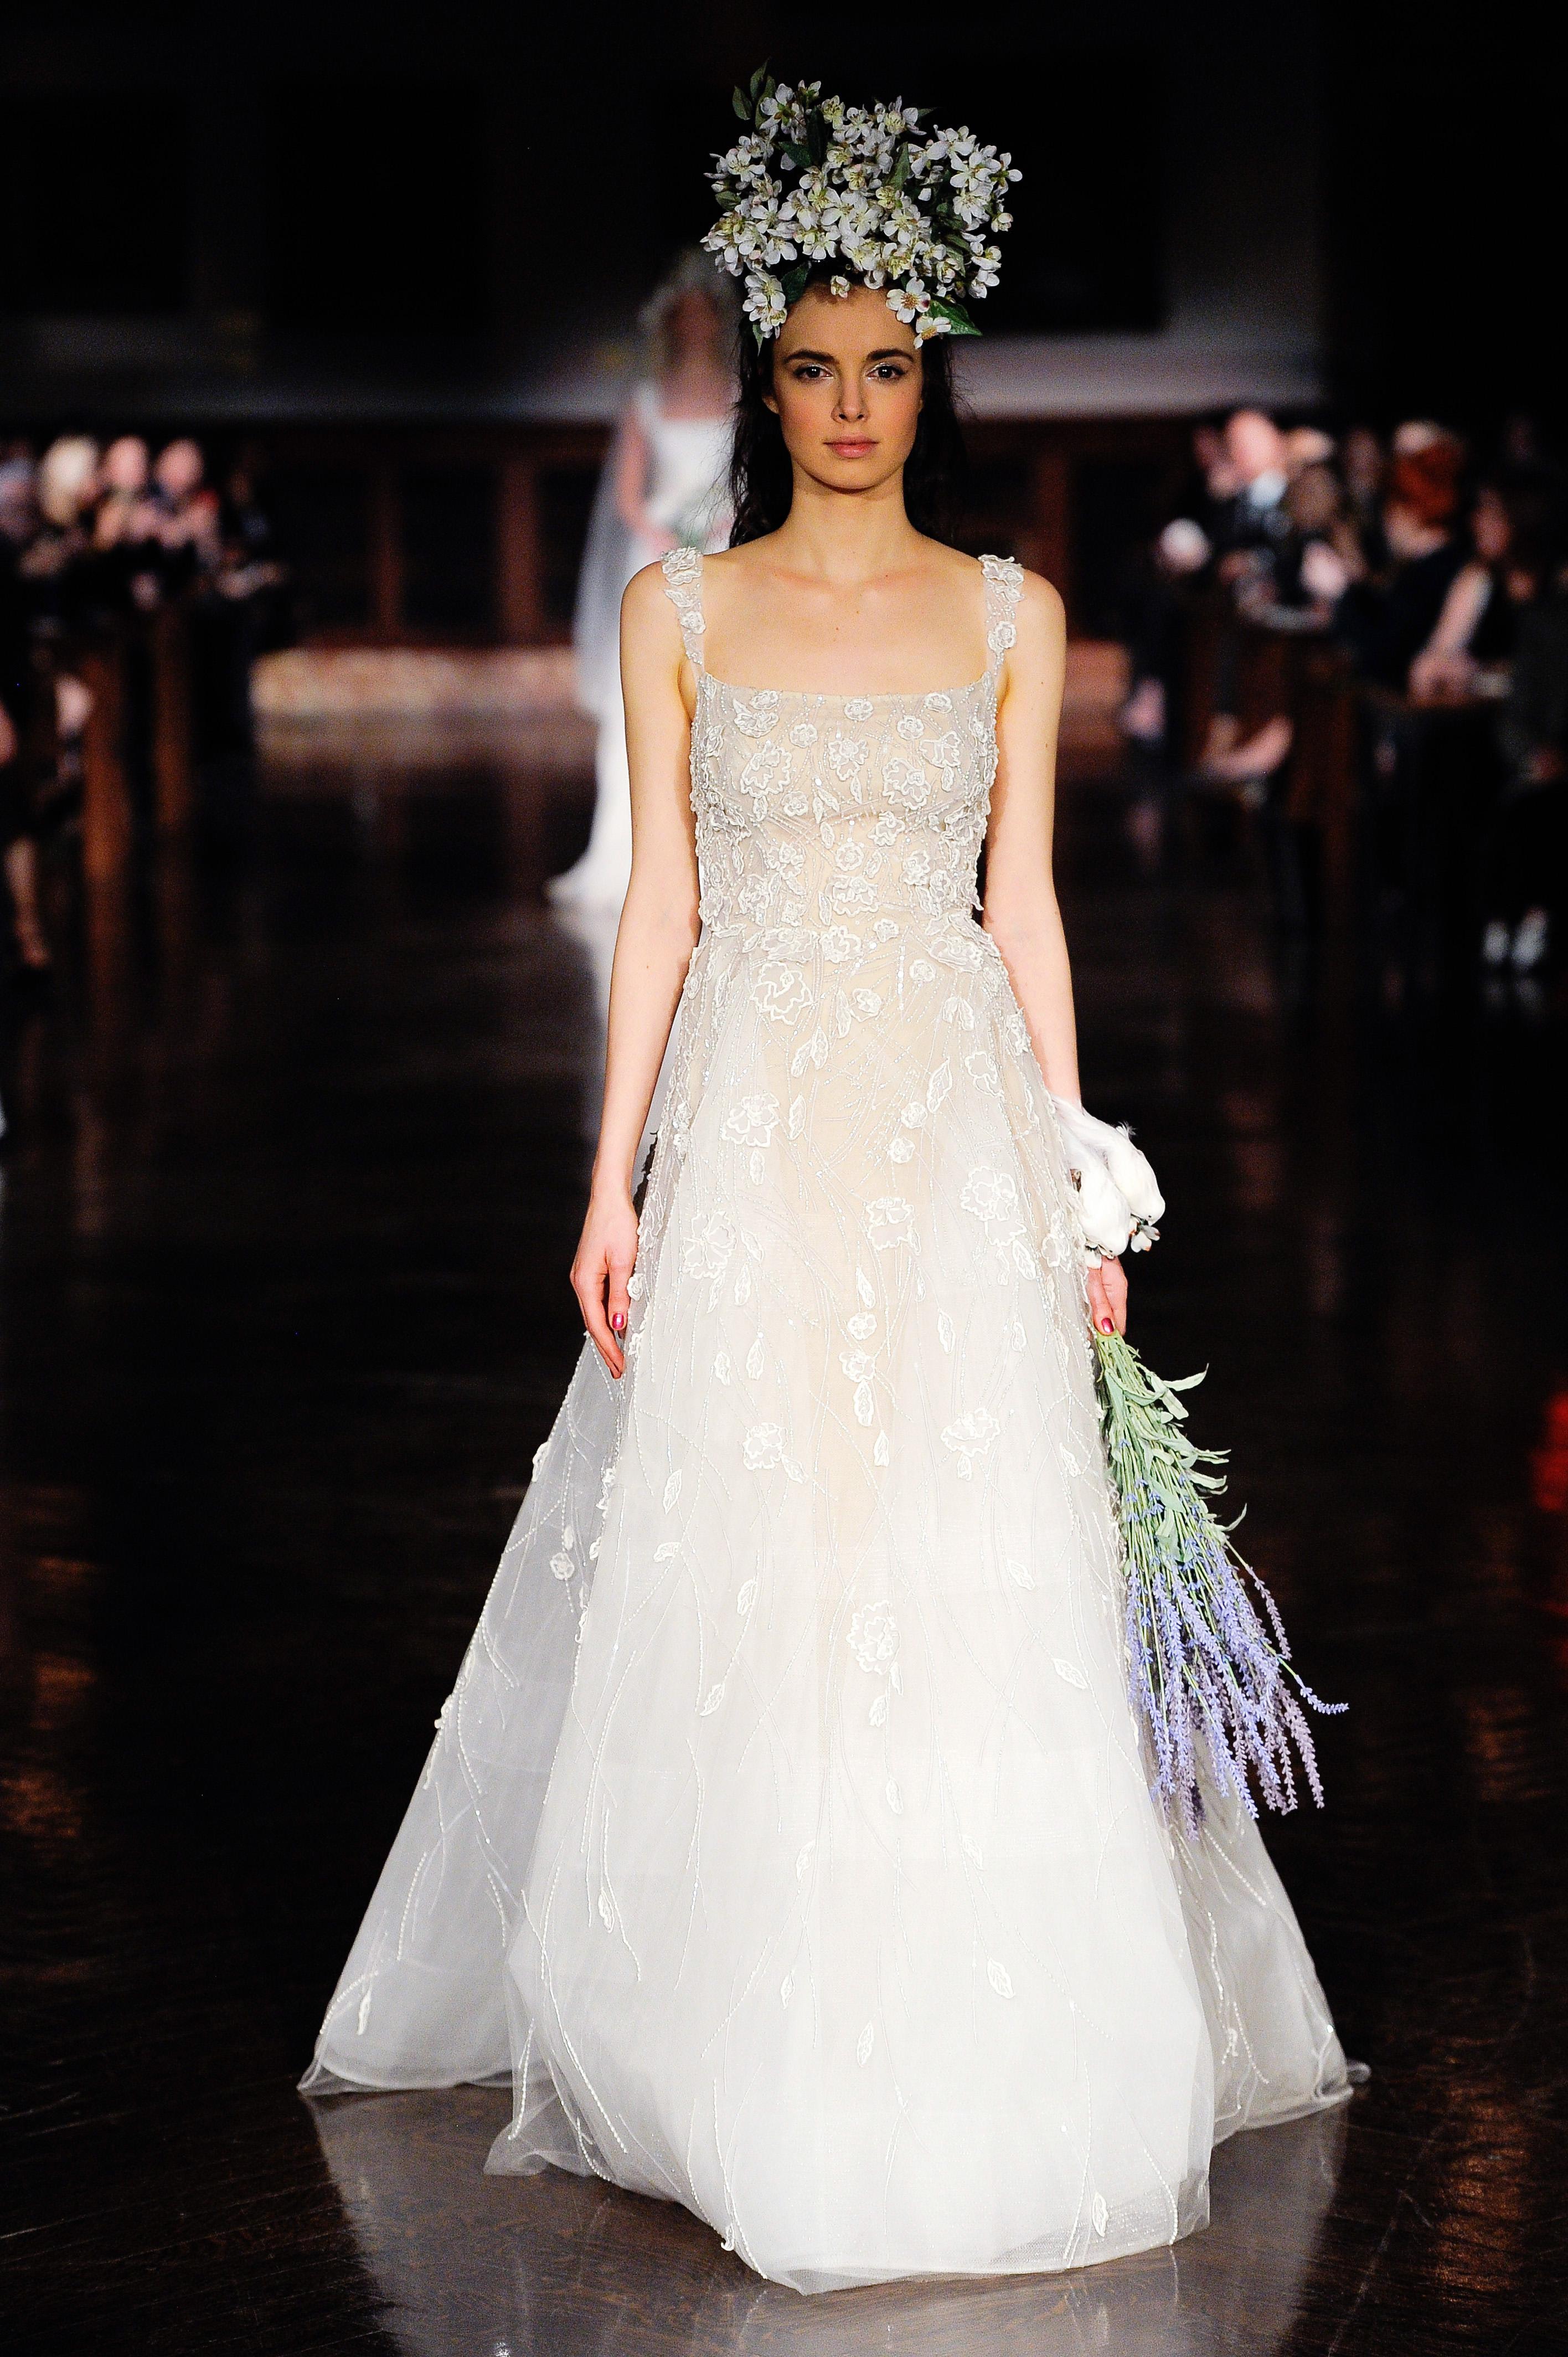 reem acra wedding dress spring 2019 square neck a-line lace